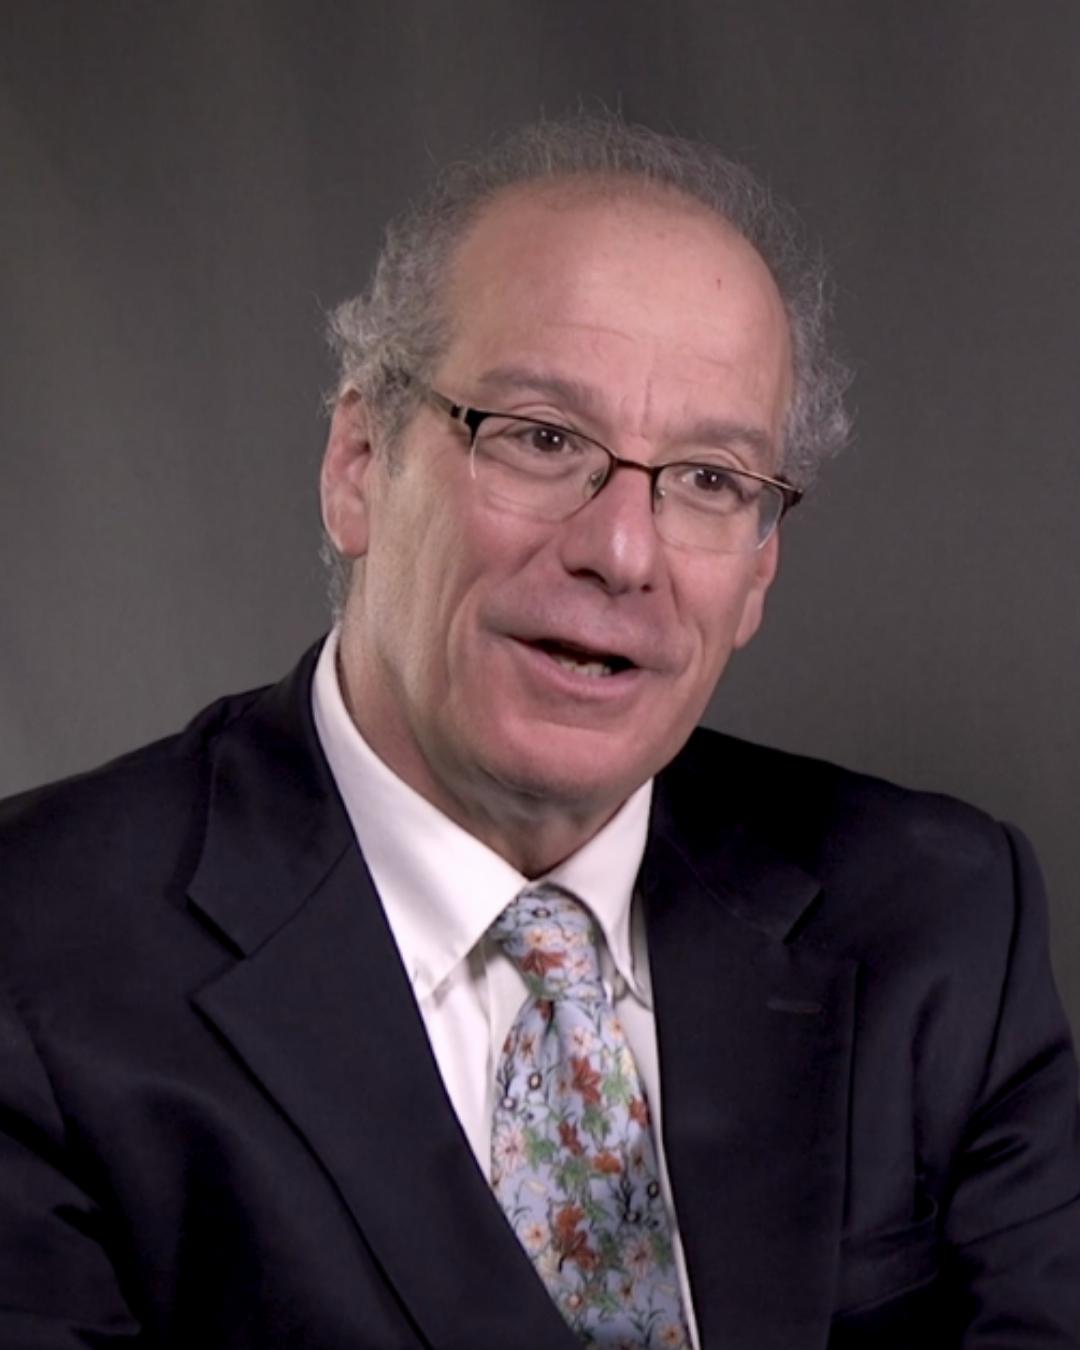 Alan Finkel—The Impact Report